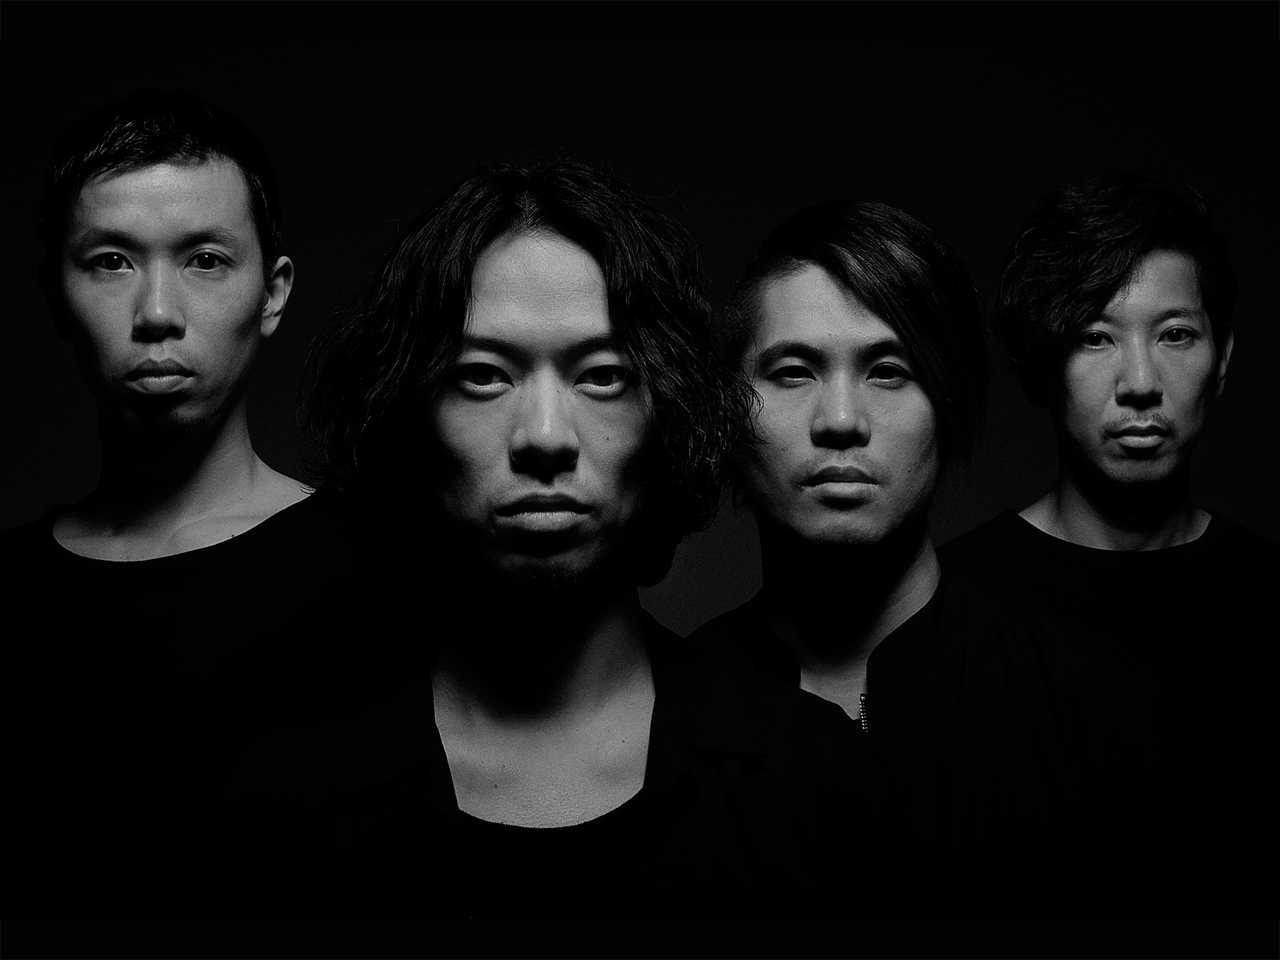 L→R 岡峰光舟(Ba)、山田将司(Vo)、菅波栄純(Gu)、松田晋二(Dr)